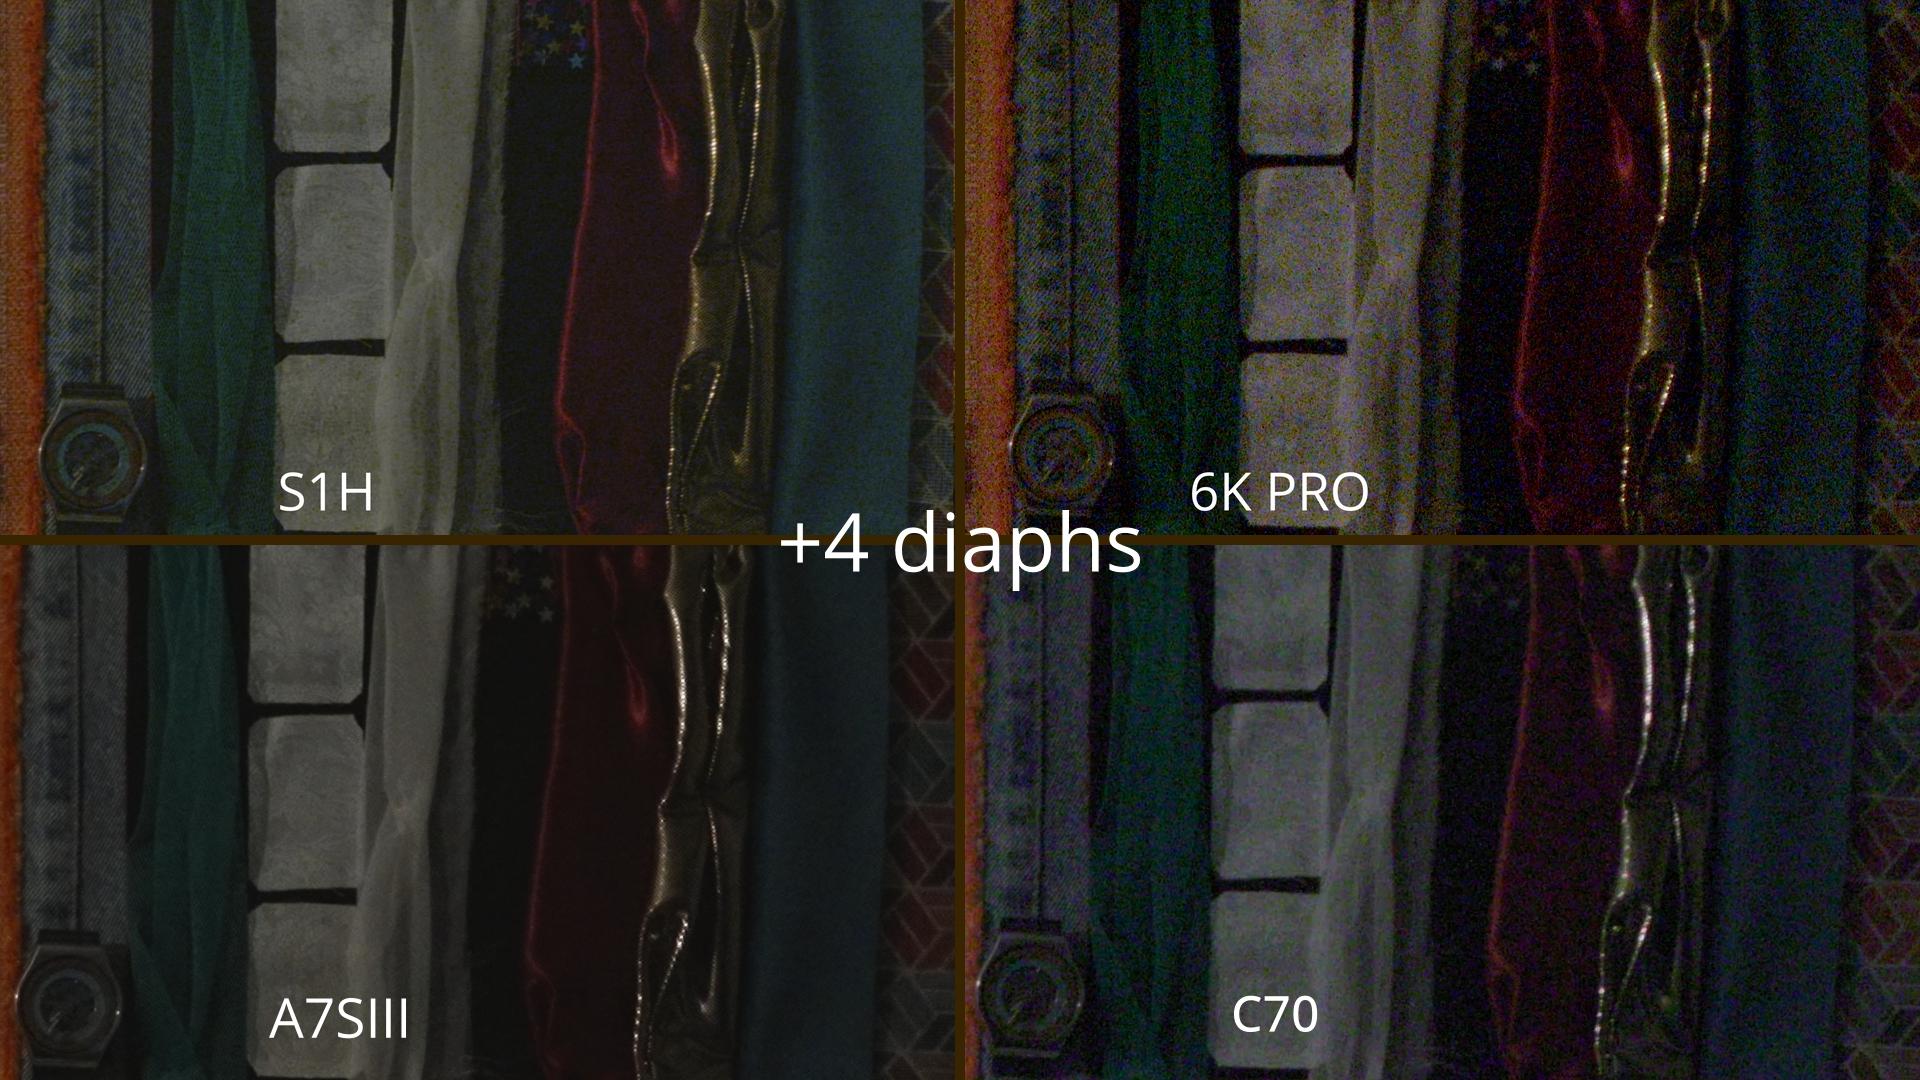 6K PRO tissus 4 comp LL_4.24.1.jpg